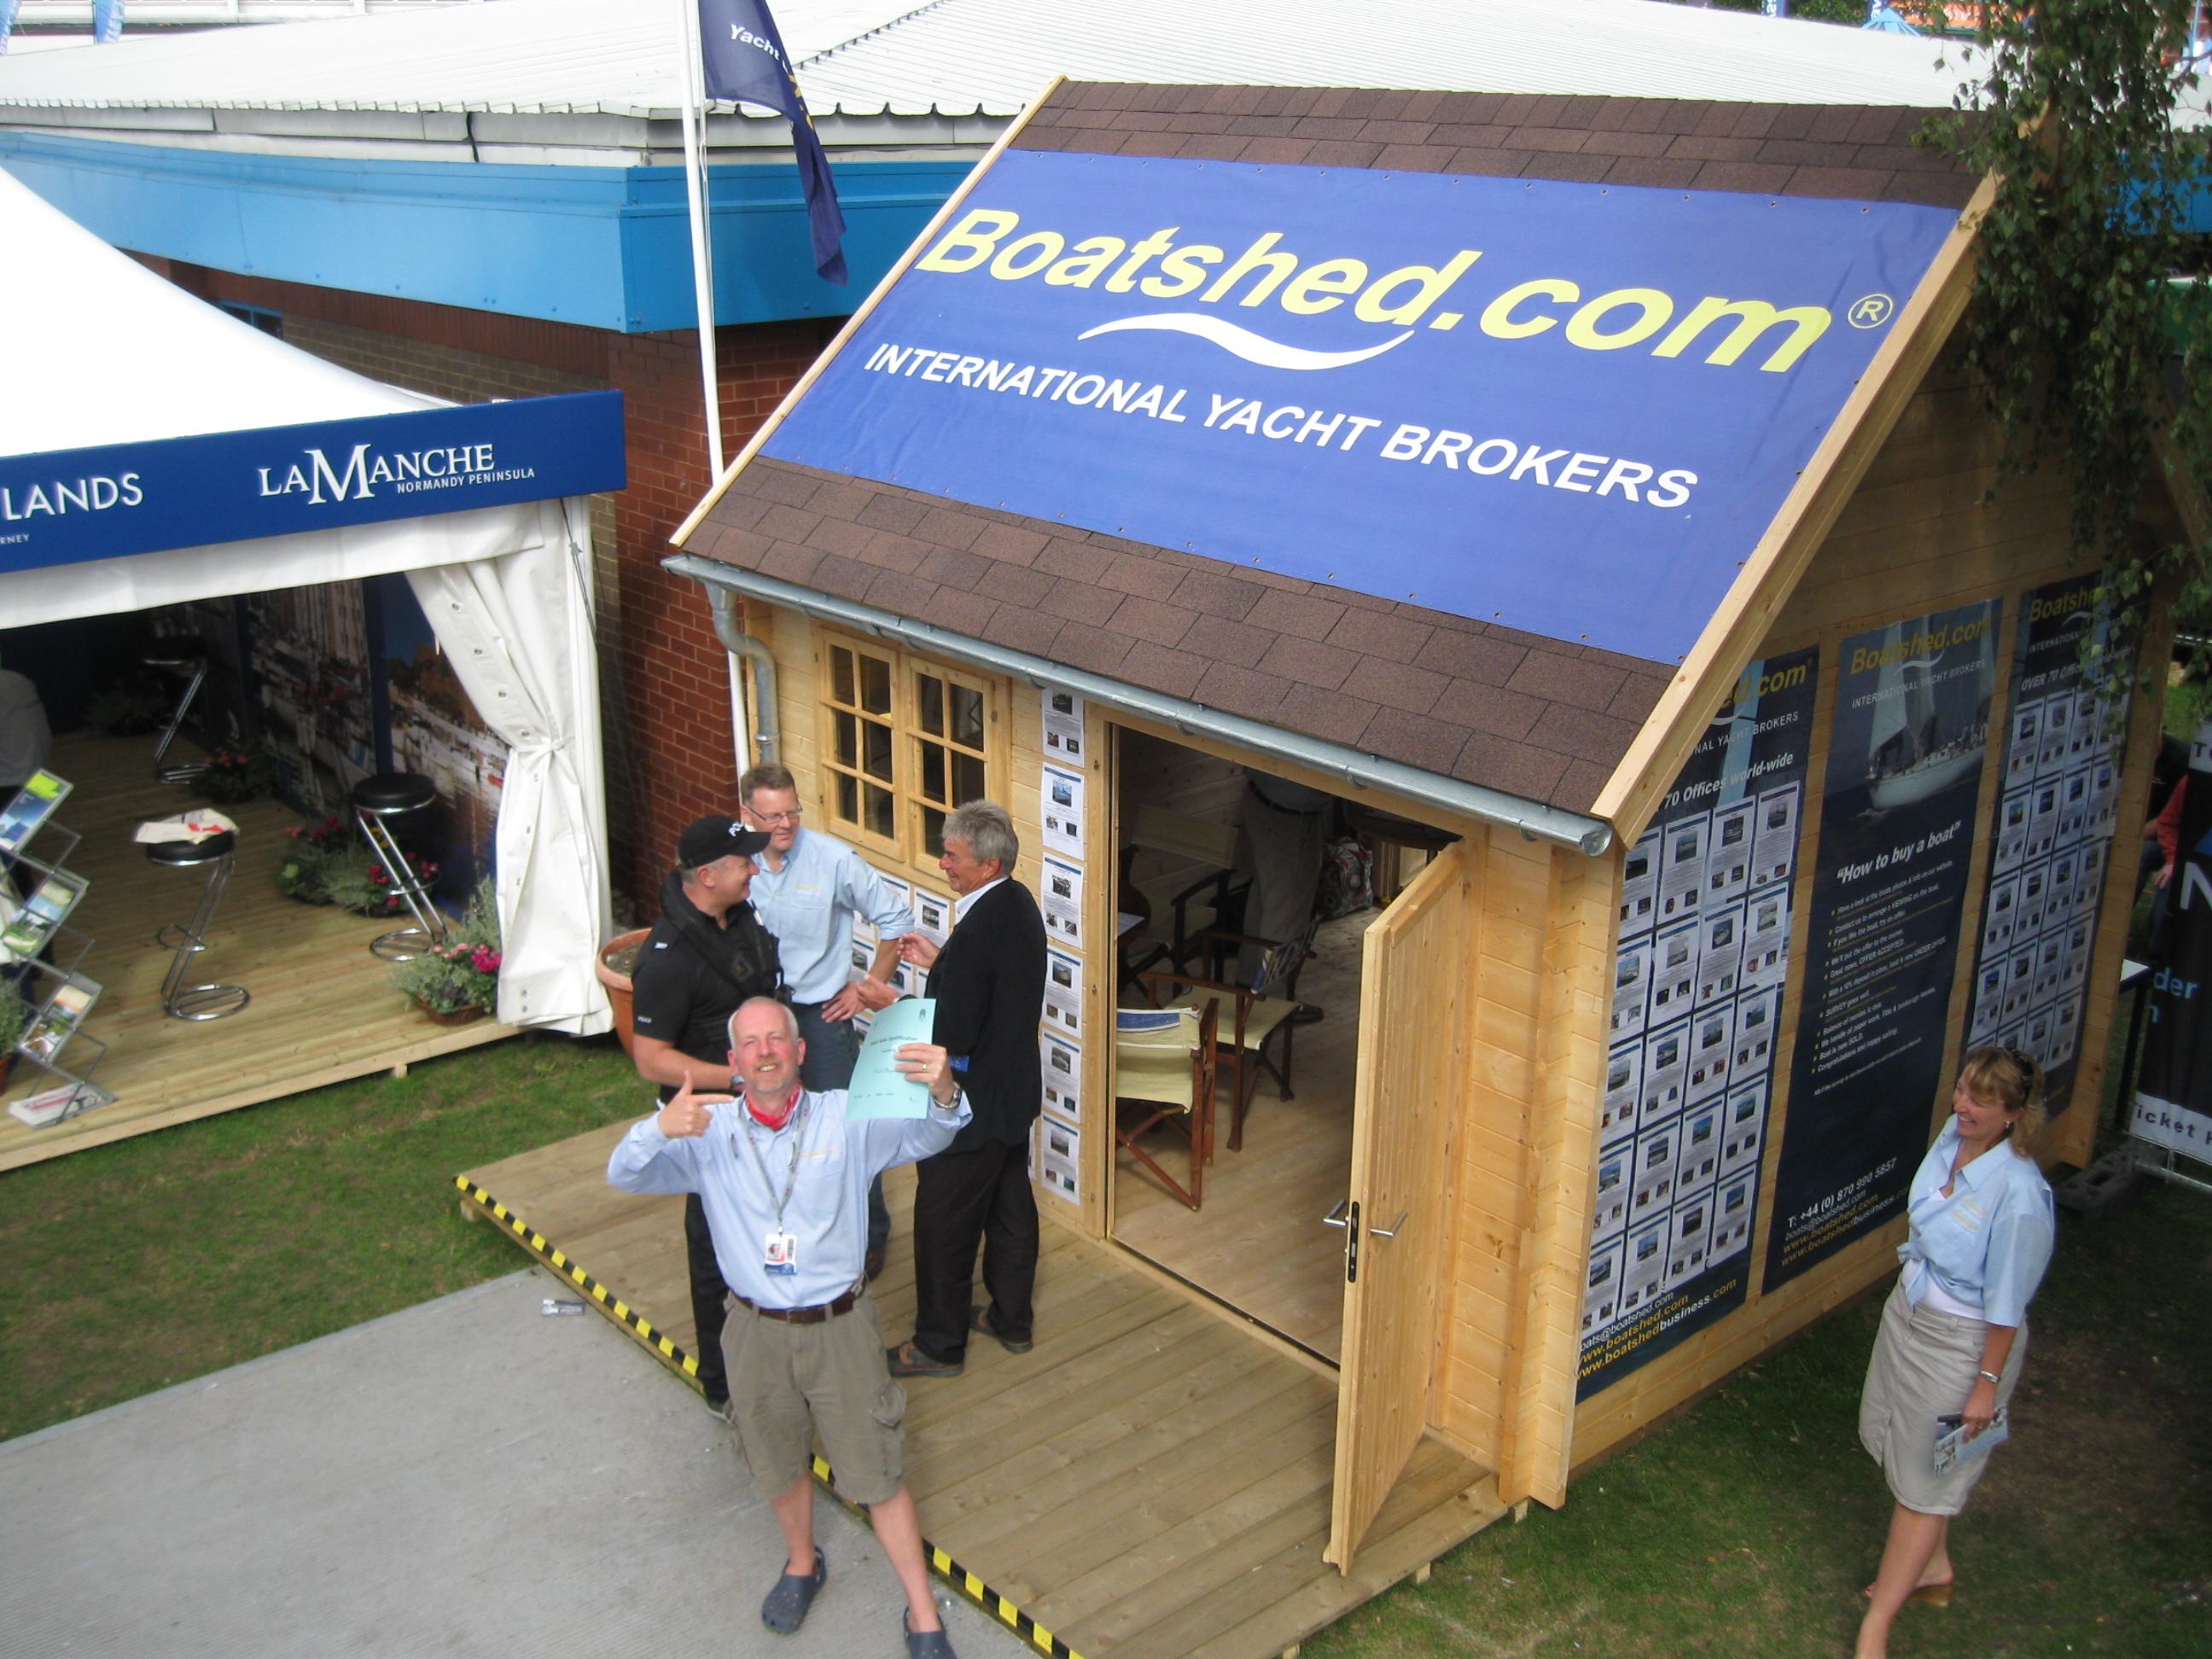 Boatshed yacht brokerage